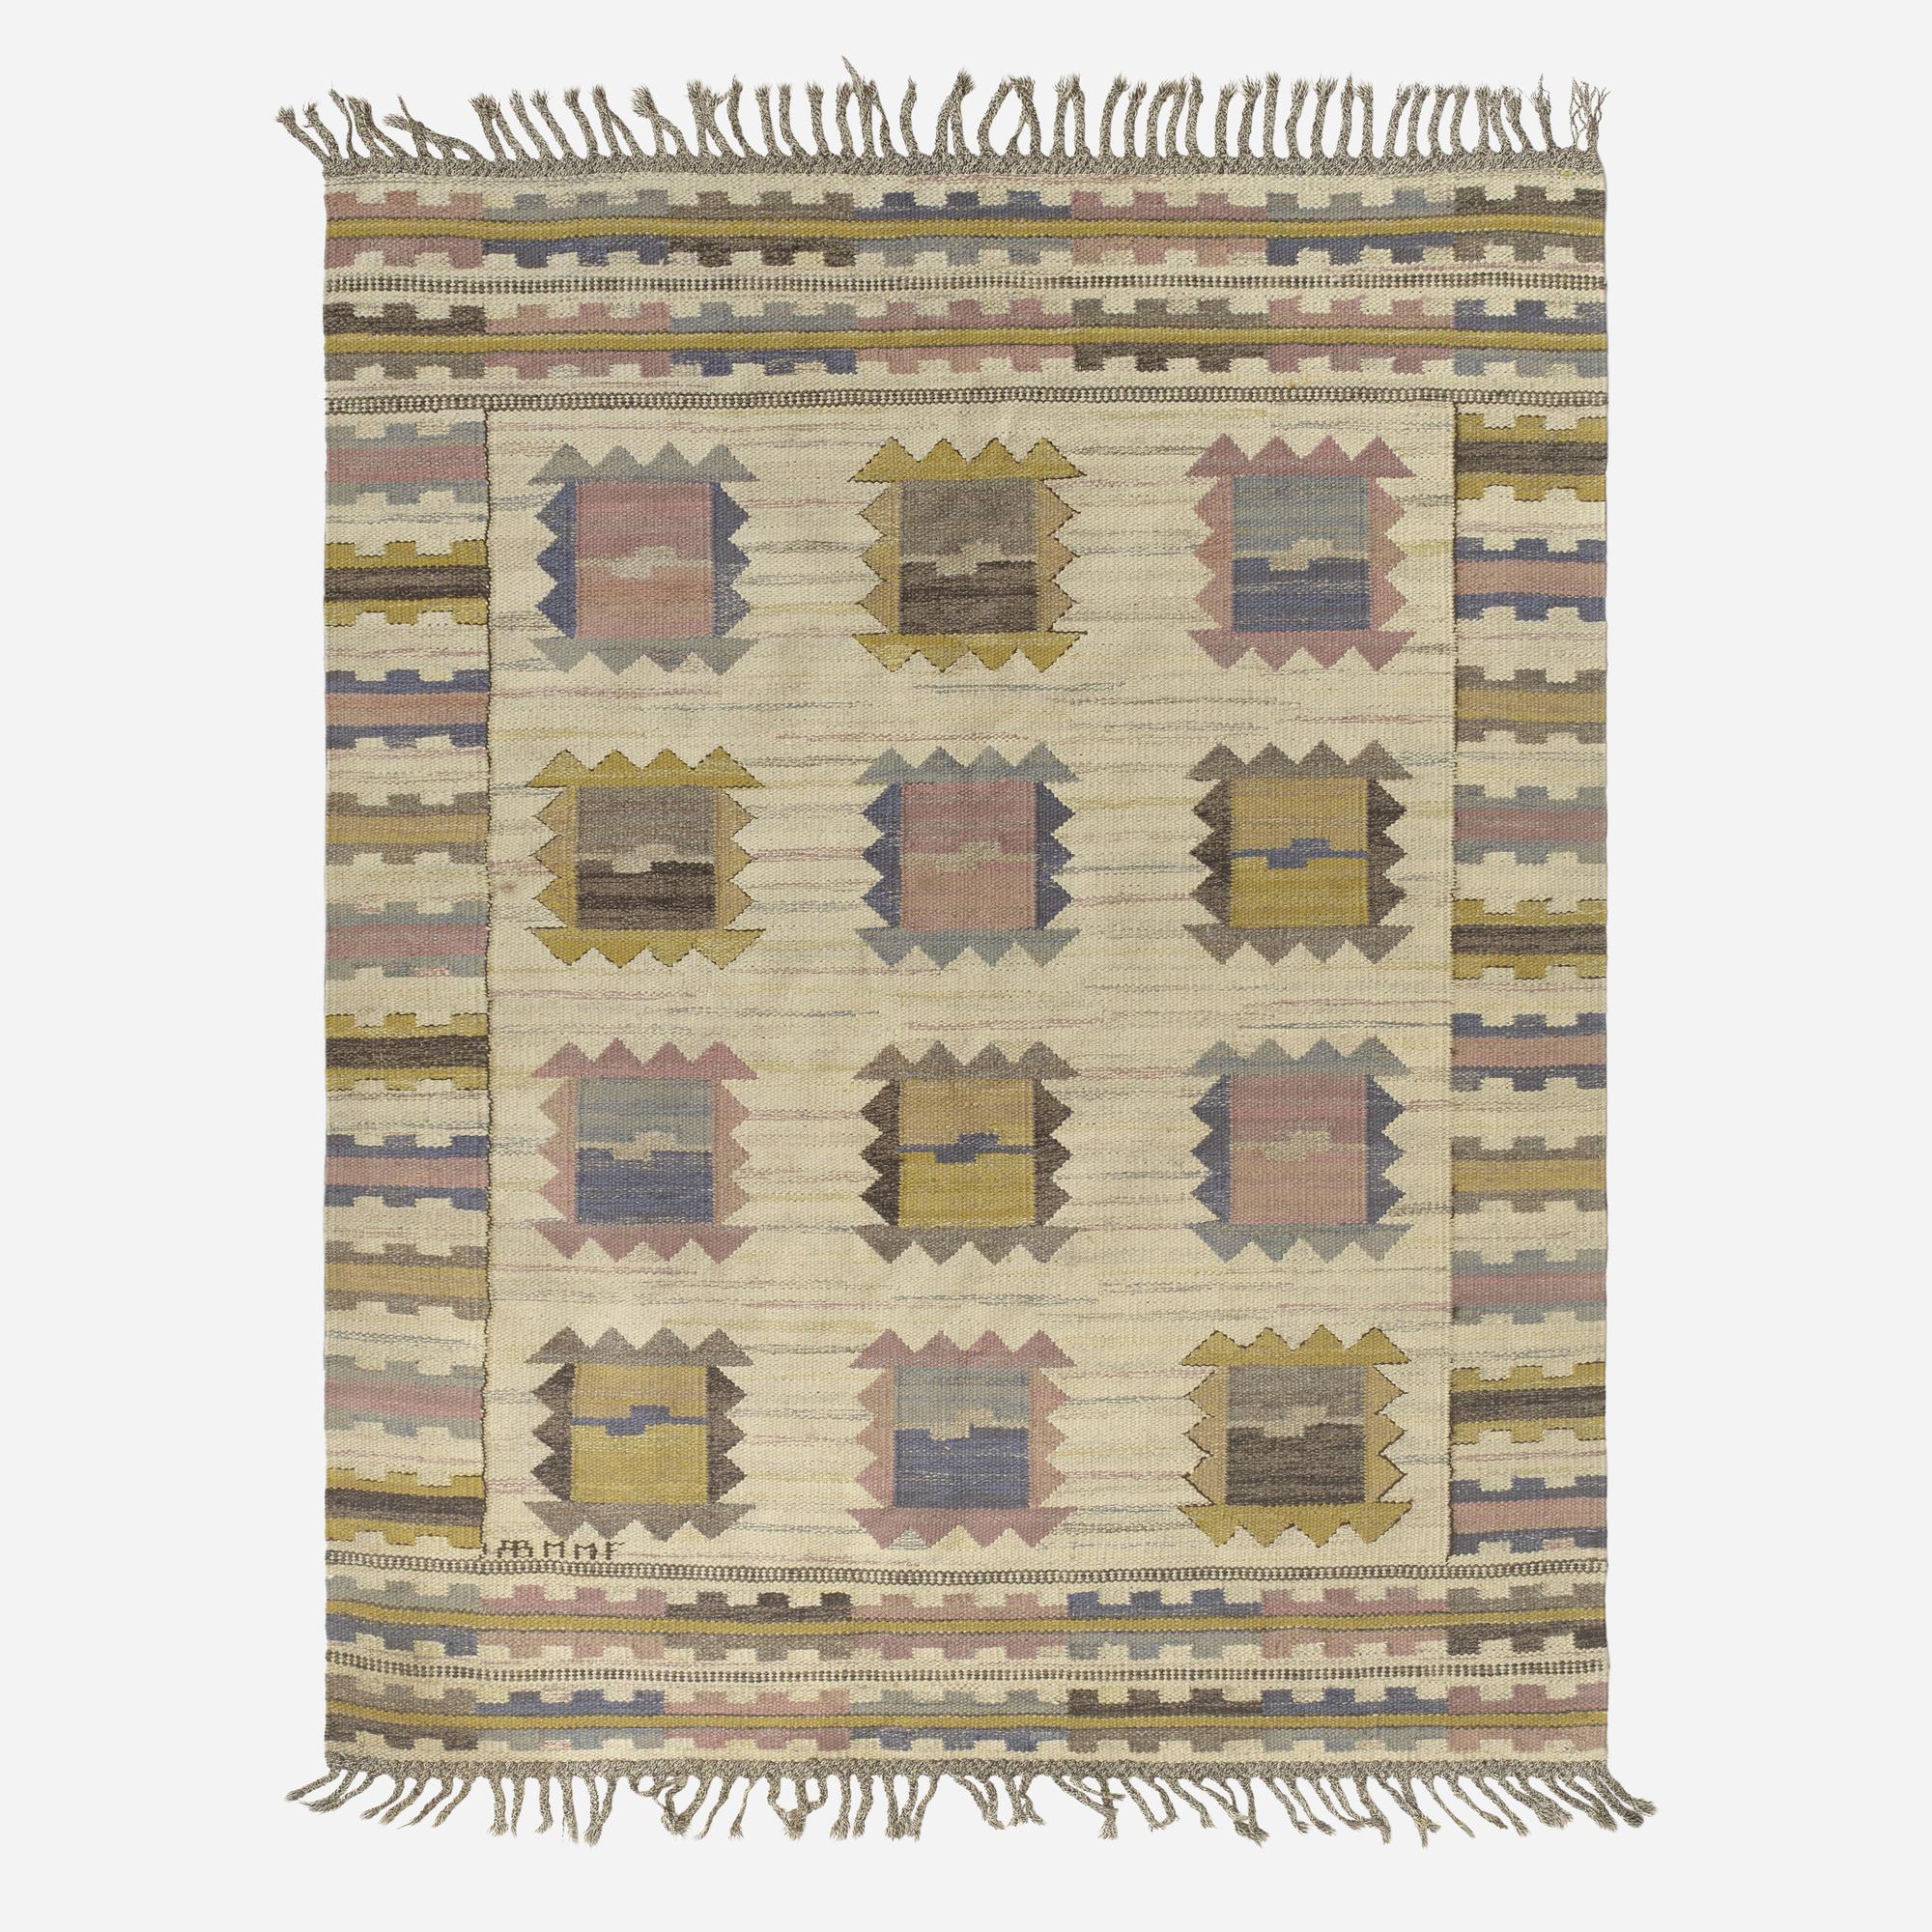 143: Märta Måås-Fjetterström / Ljusa Plador flatweave carpet (1 of 1)